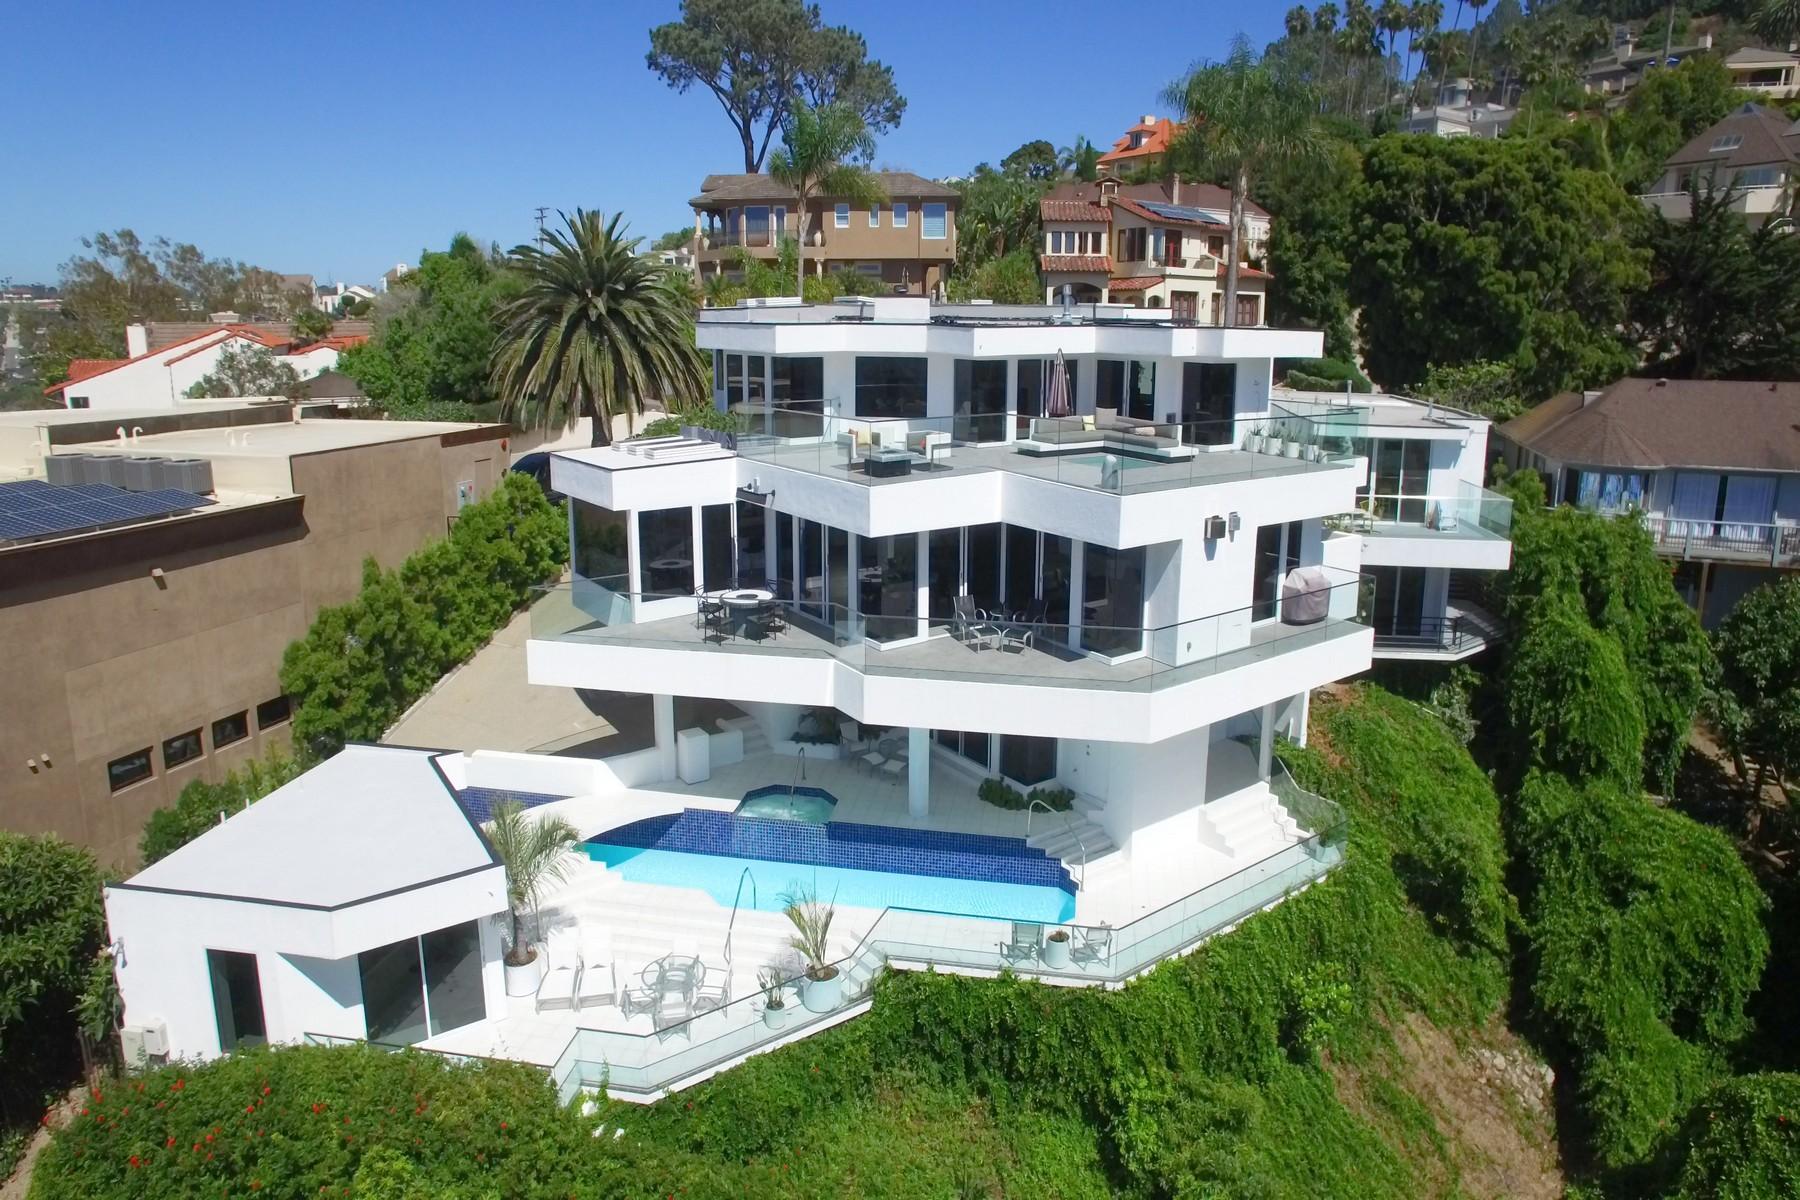 Single Family Home for Sale at 7651 Hillside La Jolla, California, 92037 United States